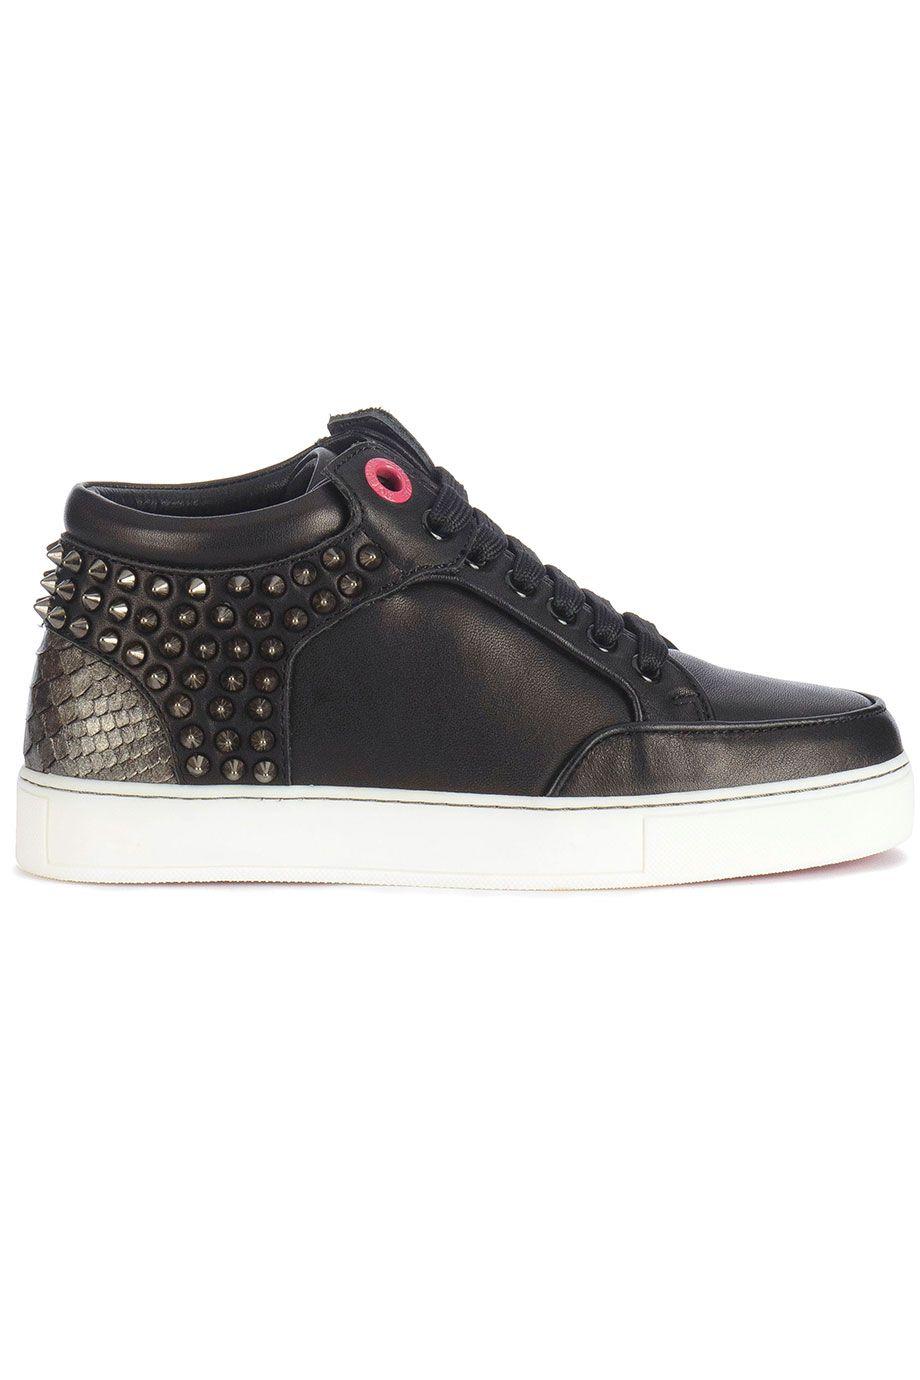 8c35c1b2c16 Trendy Royaums Kilian Black/ Titanium (zwart) Dames sneakers van het merk  royaums . Uitgevoerd in zwart.